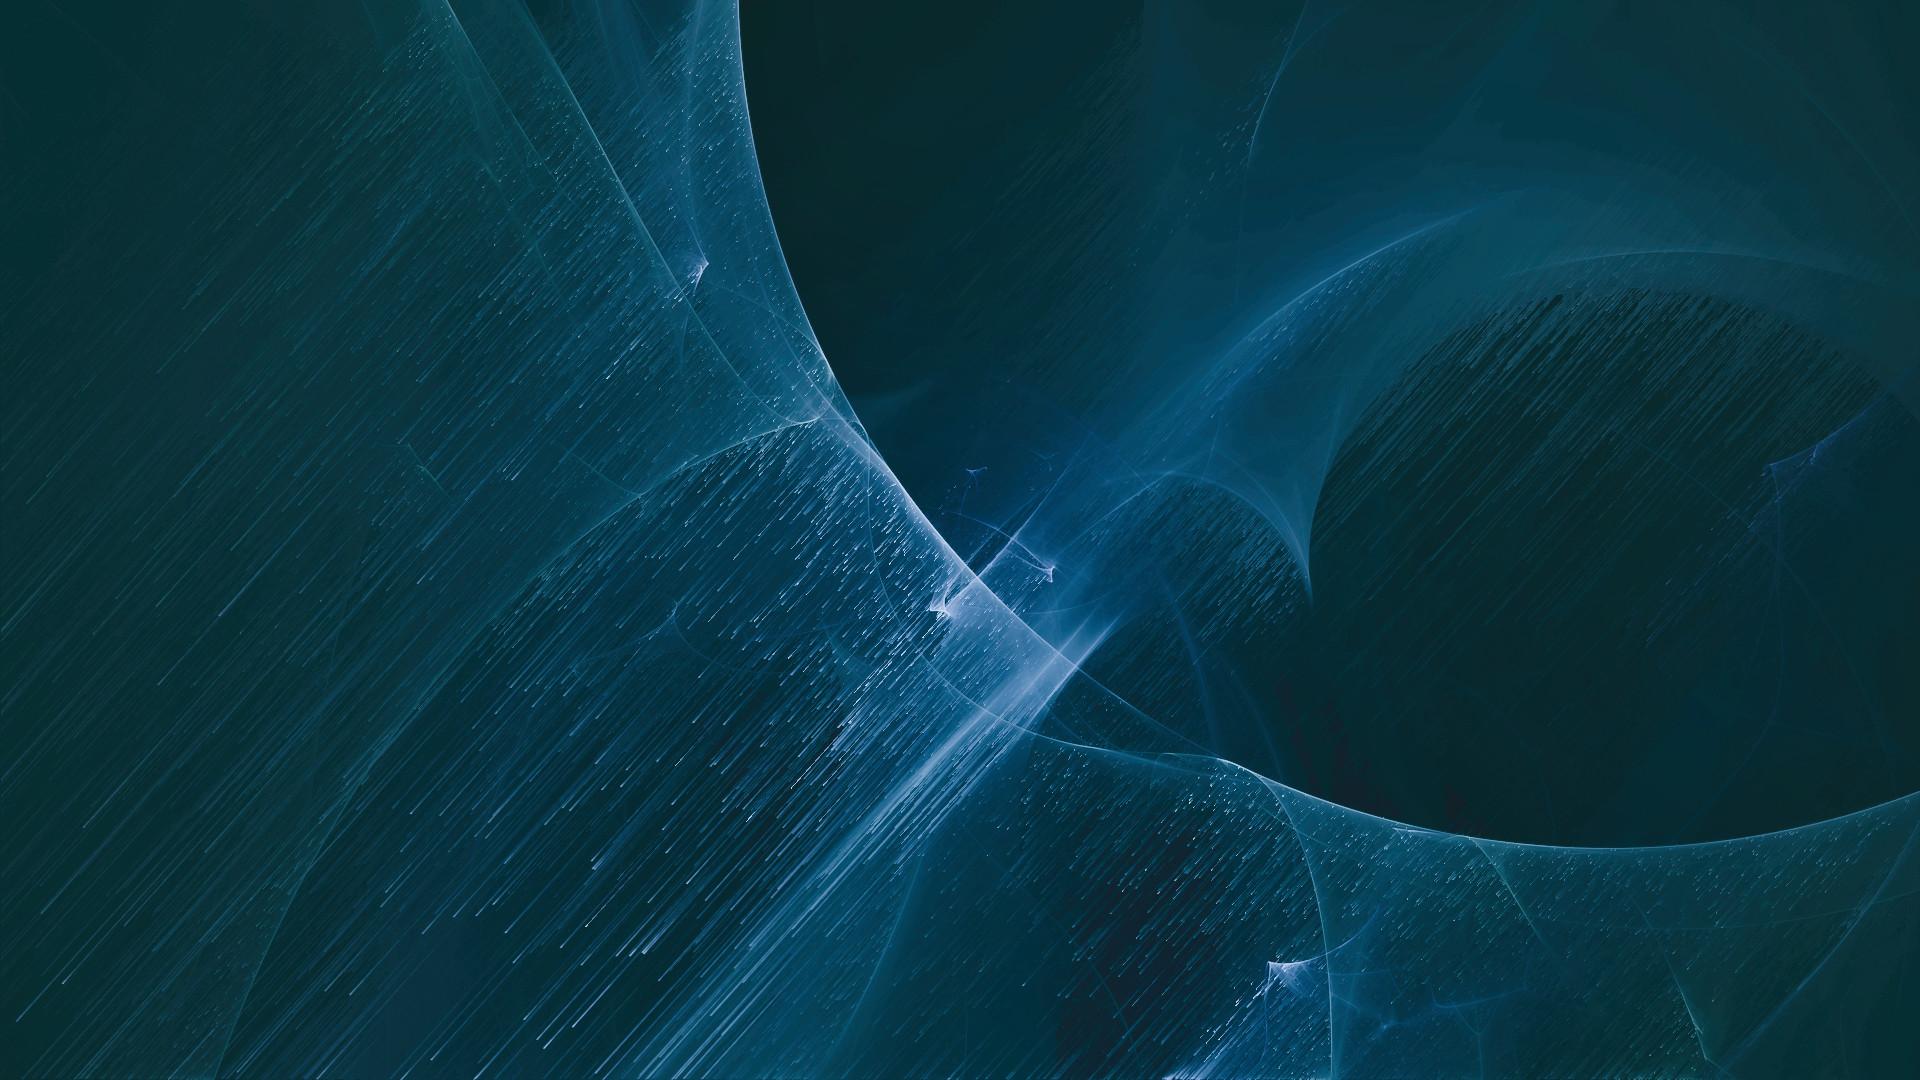 Kresimir jelusic robob3ar fractal rain 4